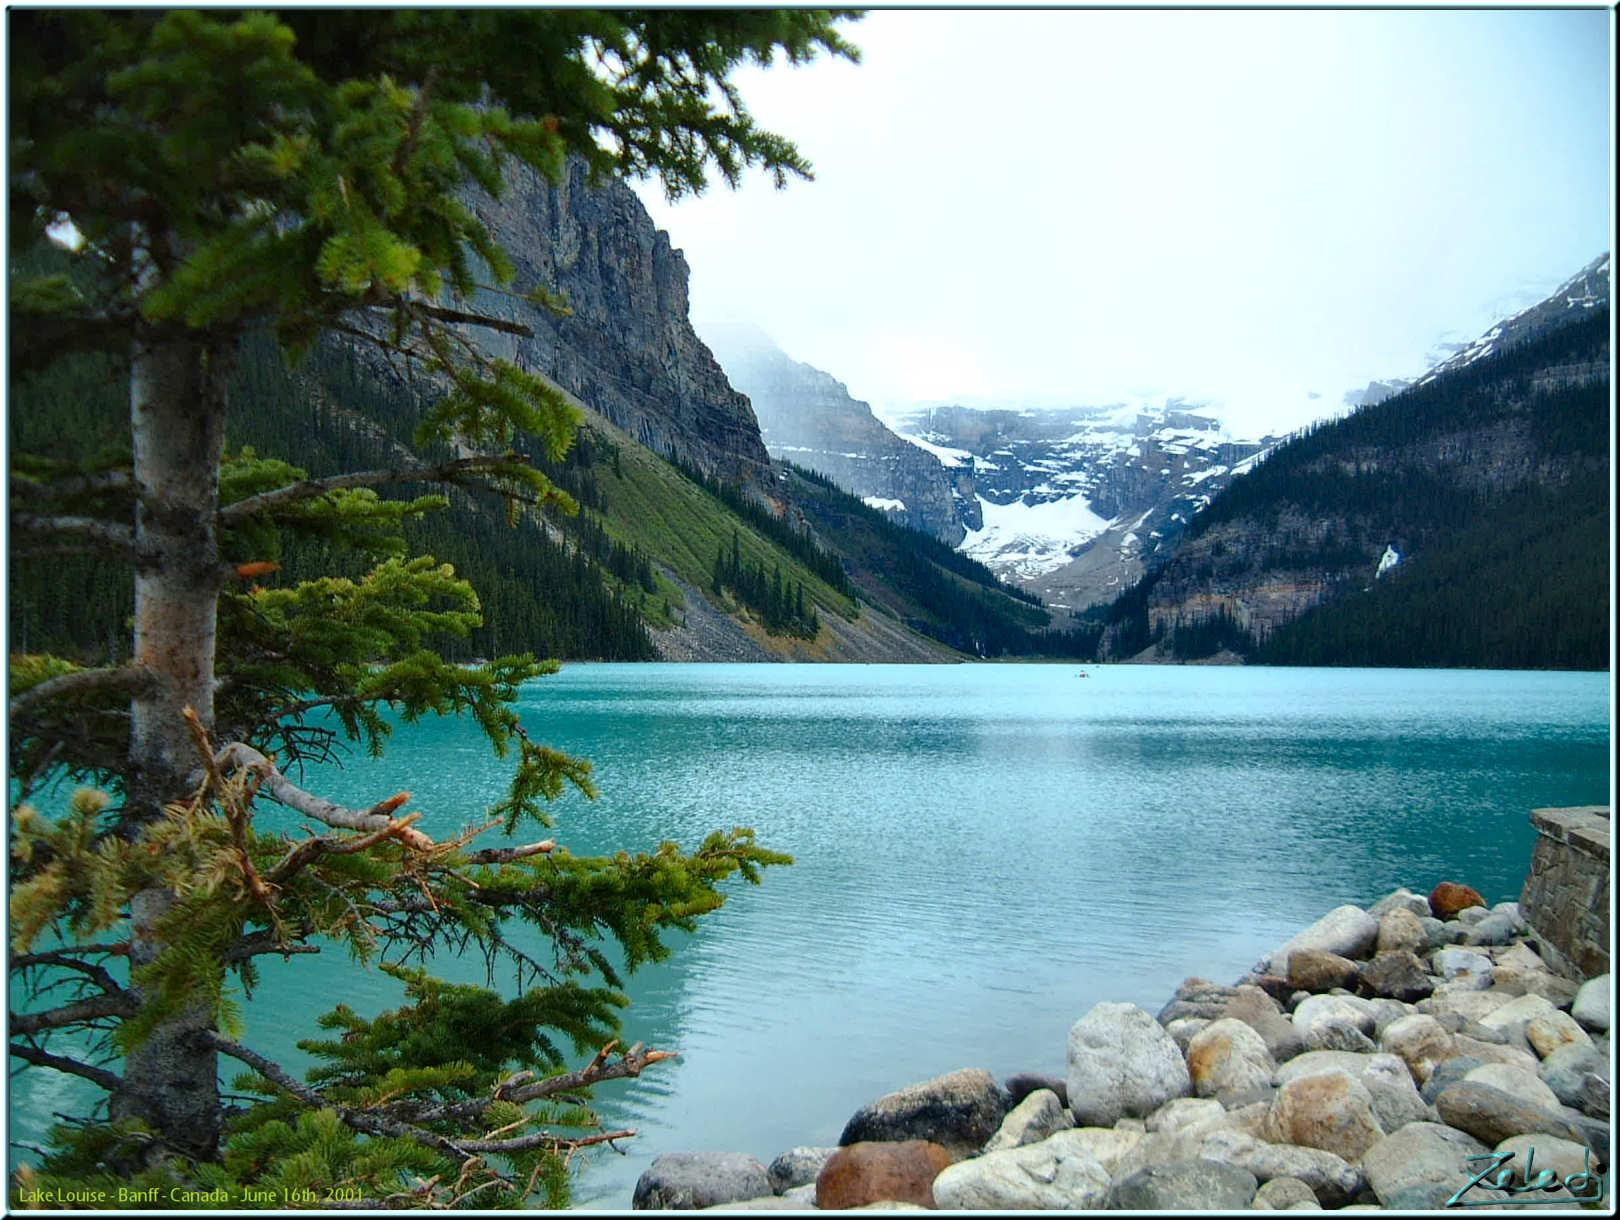 Papel de Parede Lago Louise   Canad Wallpaper para Download no 1620x1220